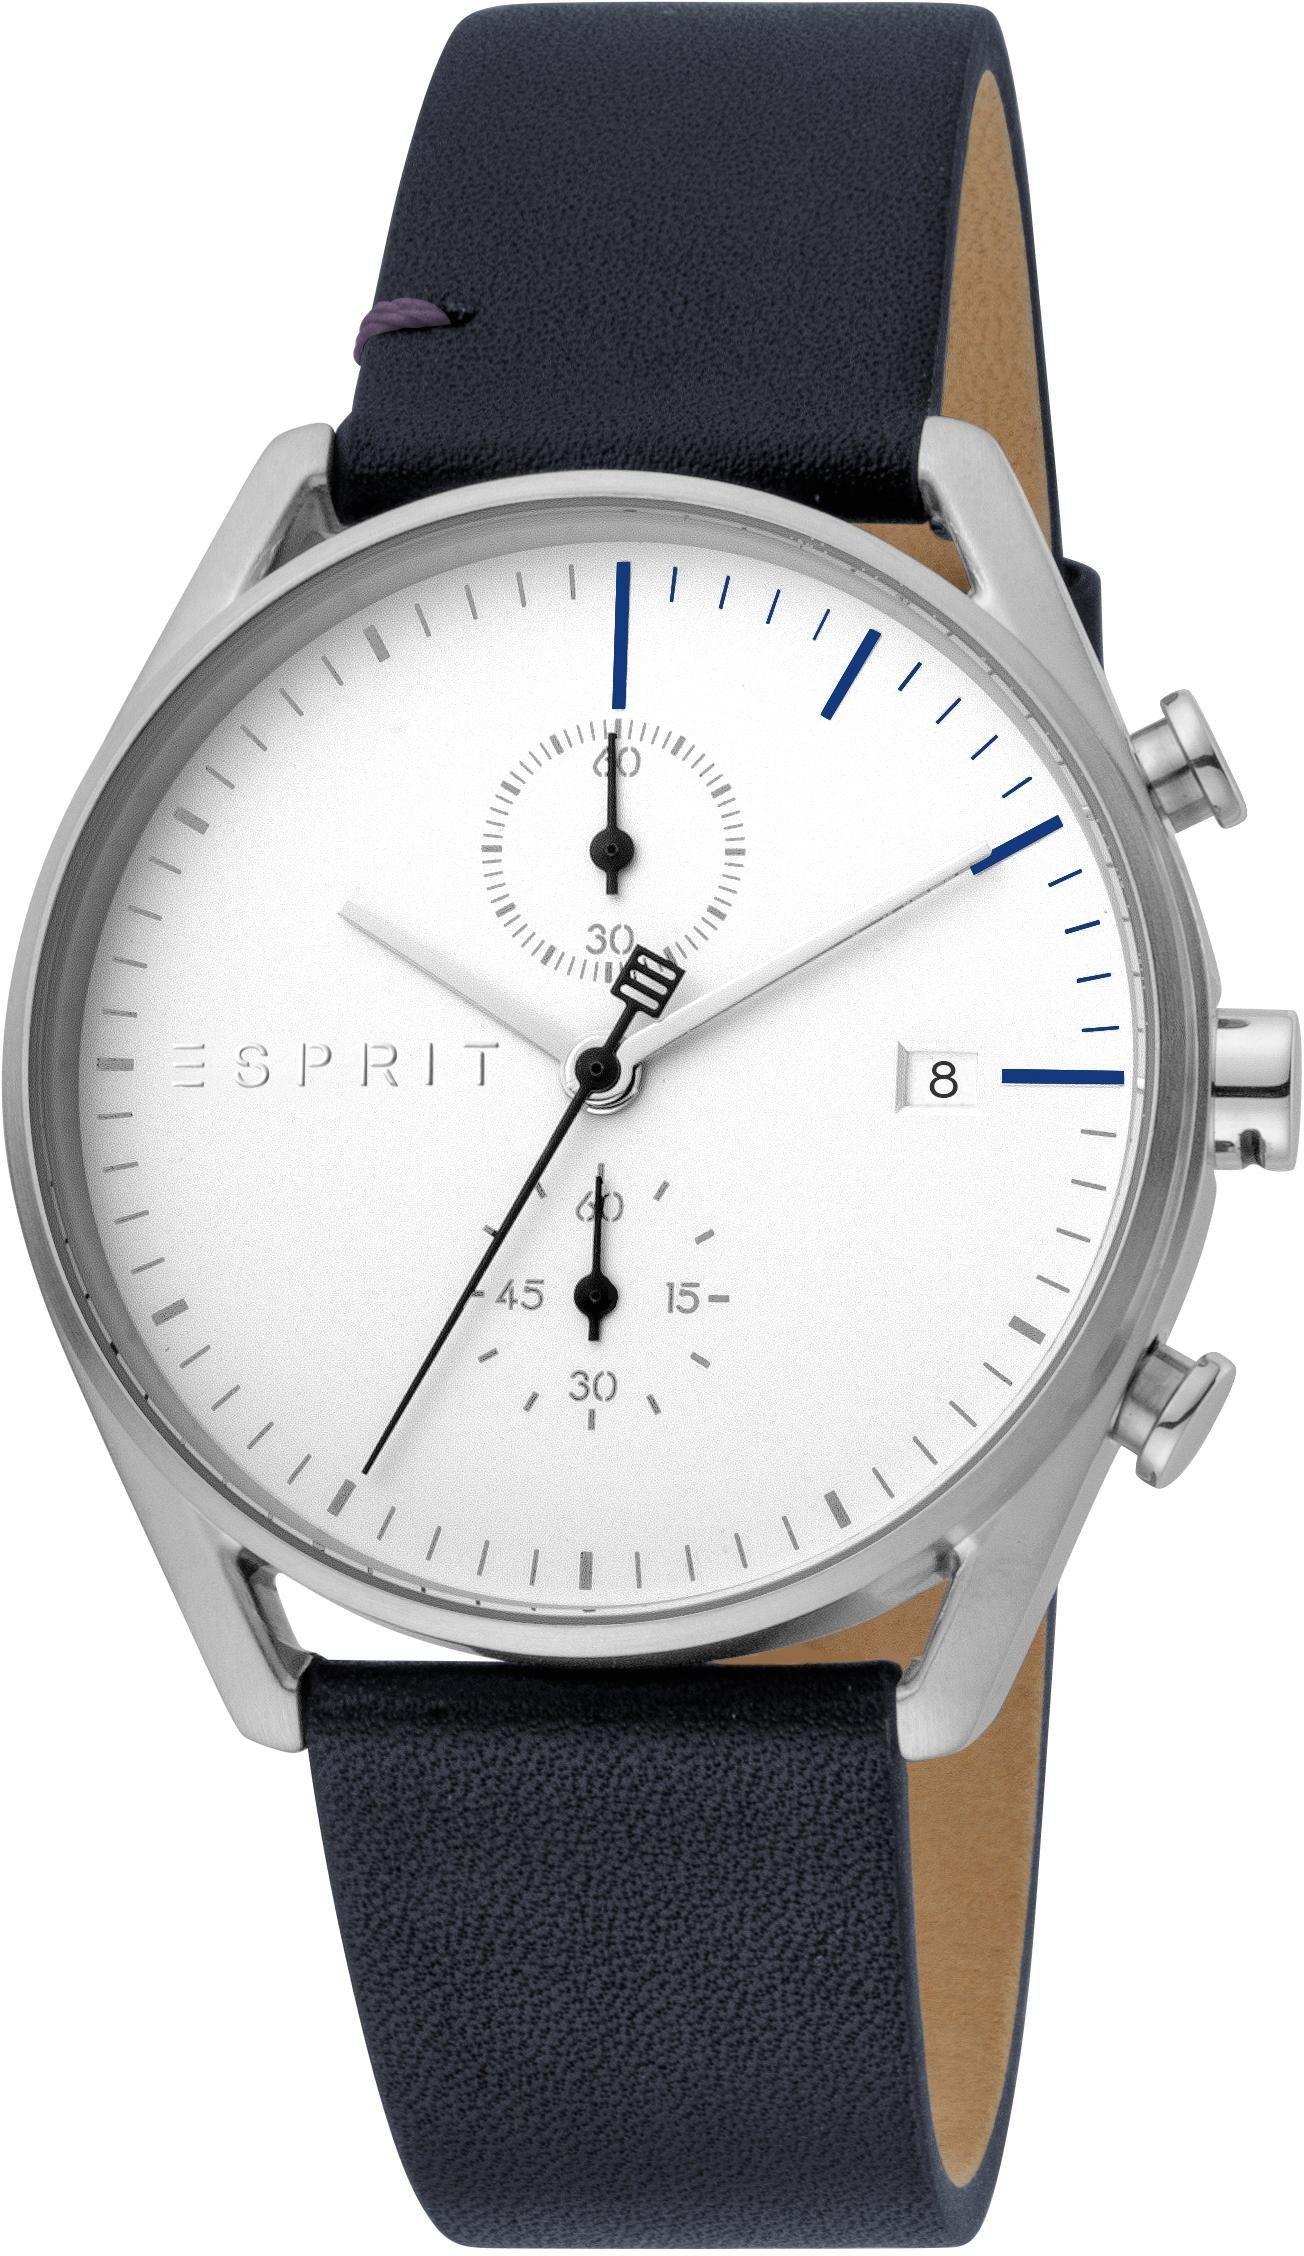 Esprit Chronograph »ES1G098L0025«